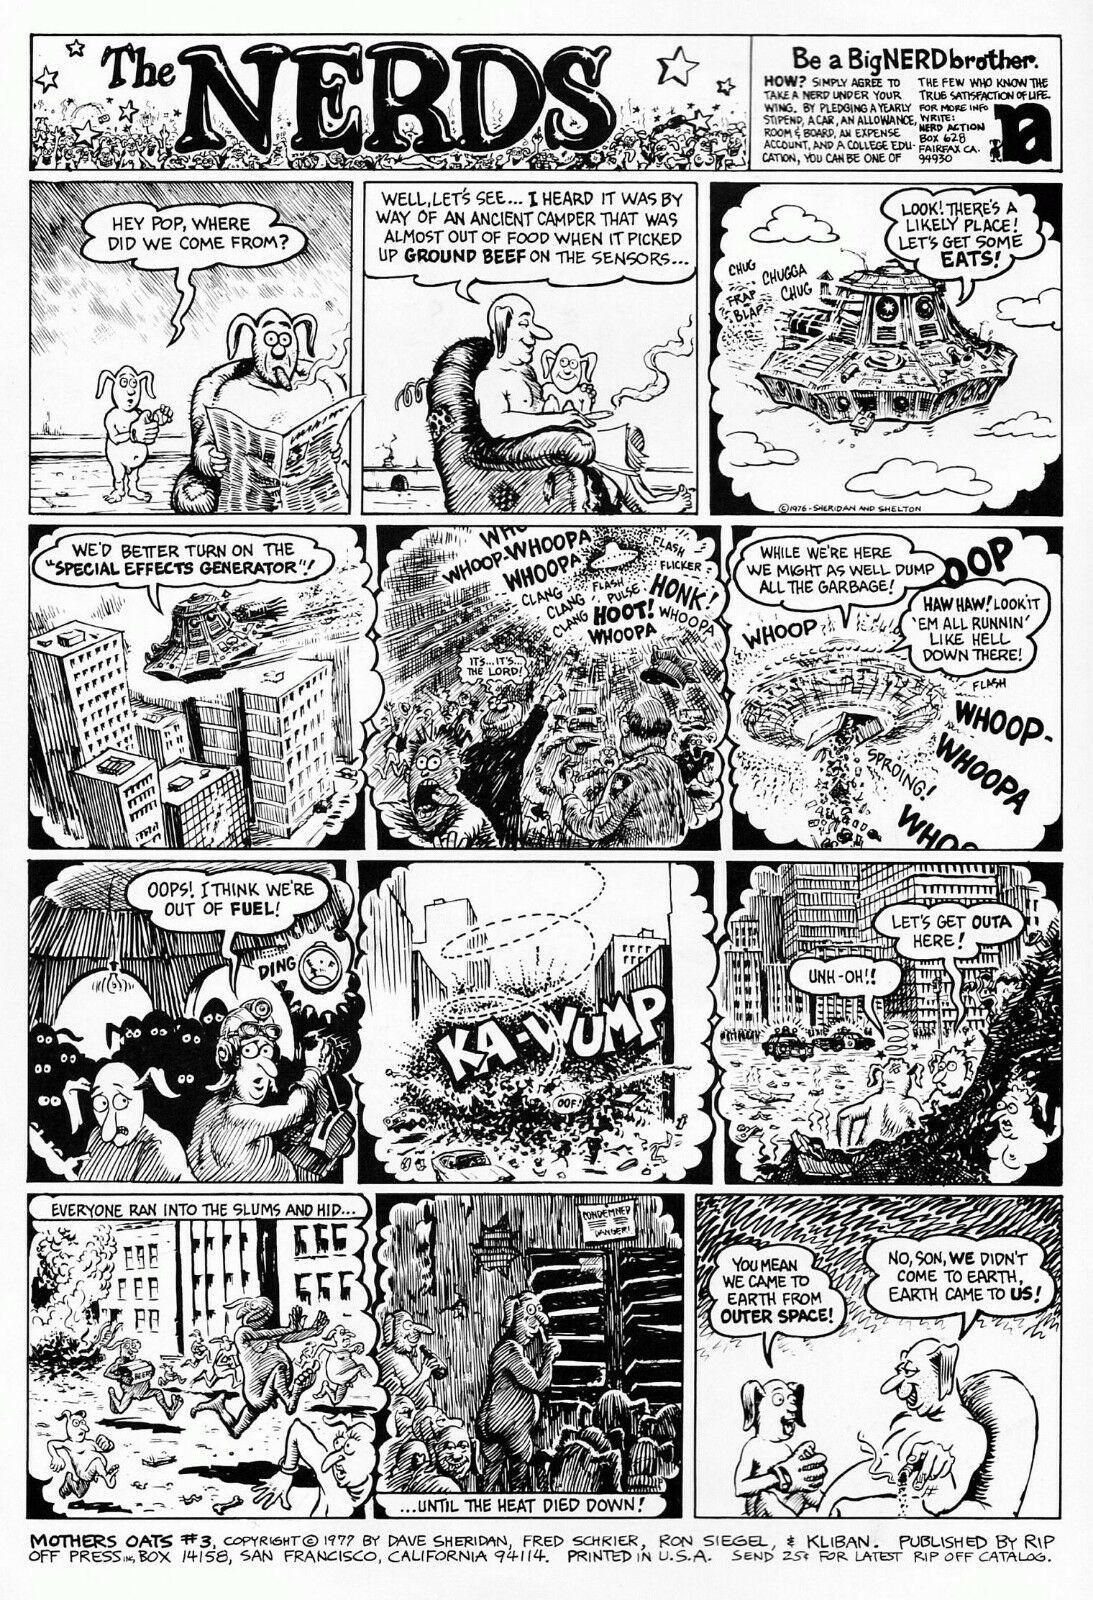 Mother's Oats 3, Sheridan, Schrier, Overland Vegetable Stagecoach, ROP 1976 - ob